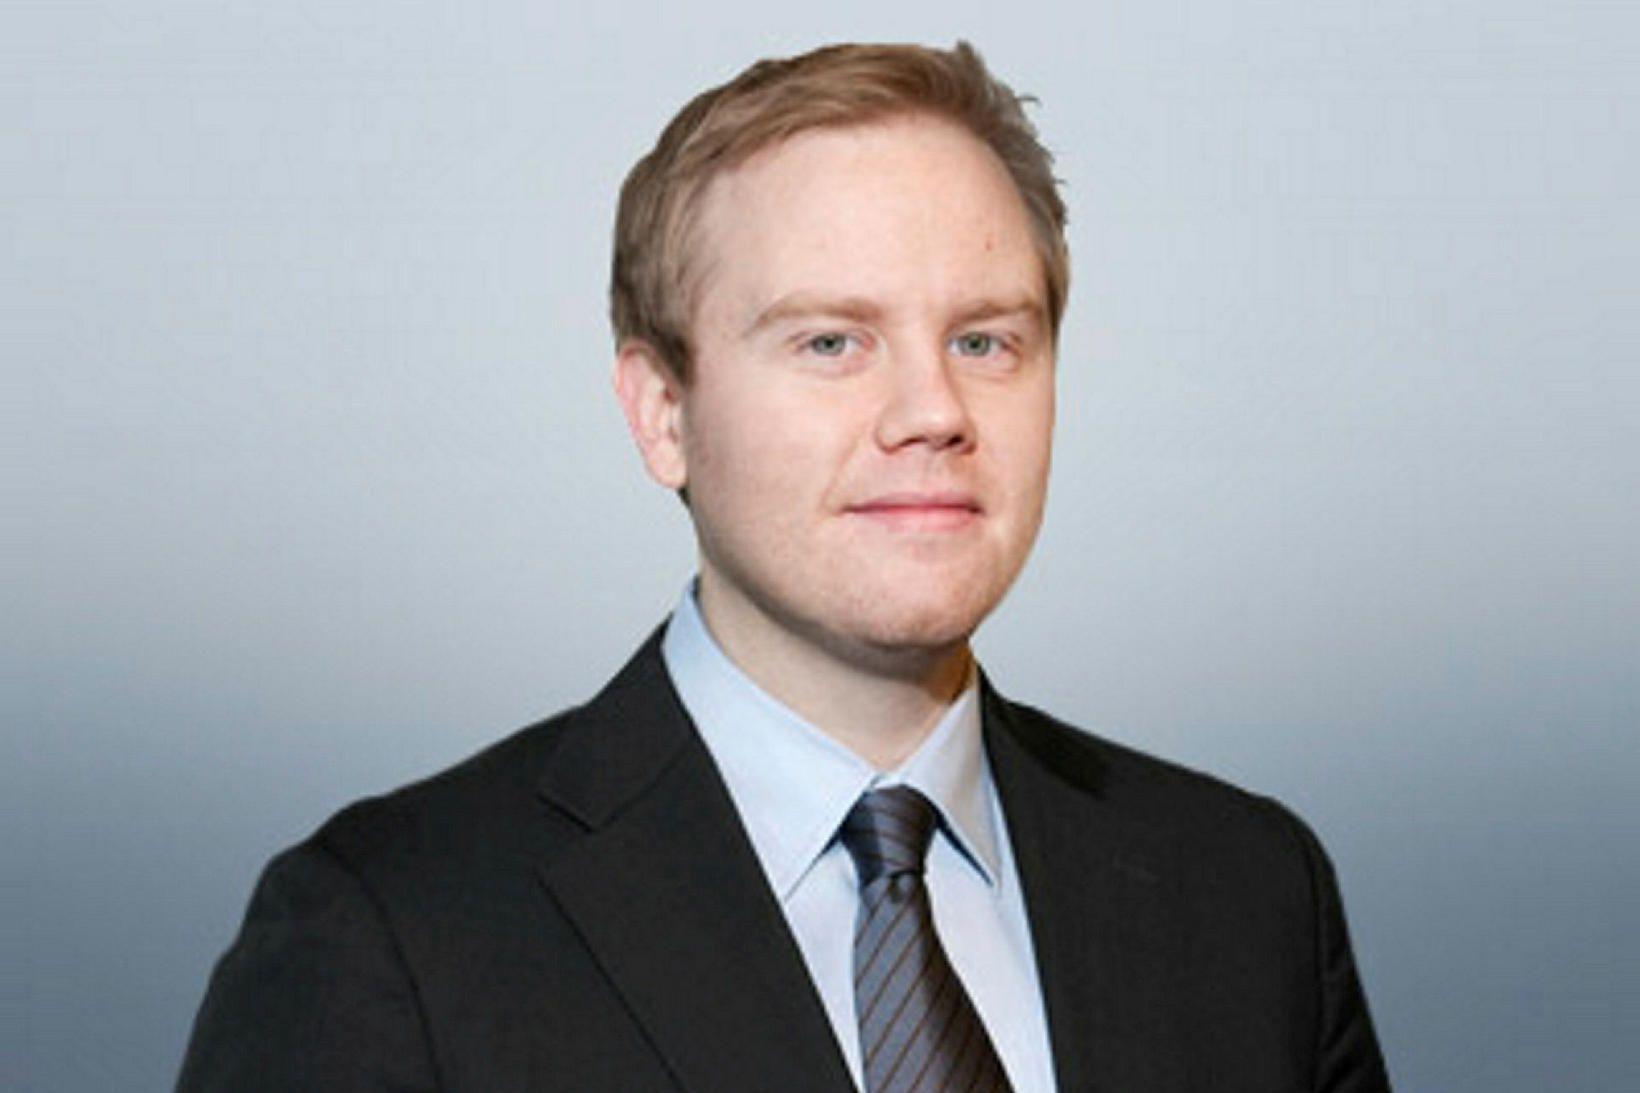 Birgir Brynjólfsson, meðeigandi Antarctica bankans í Miami, segir kosti geta …